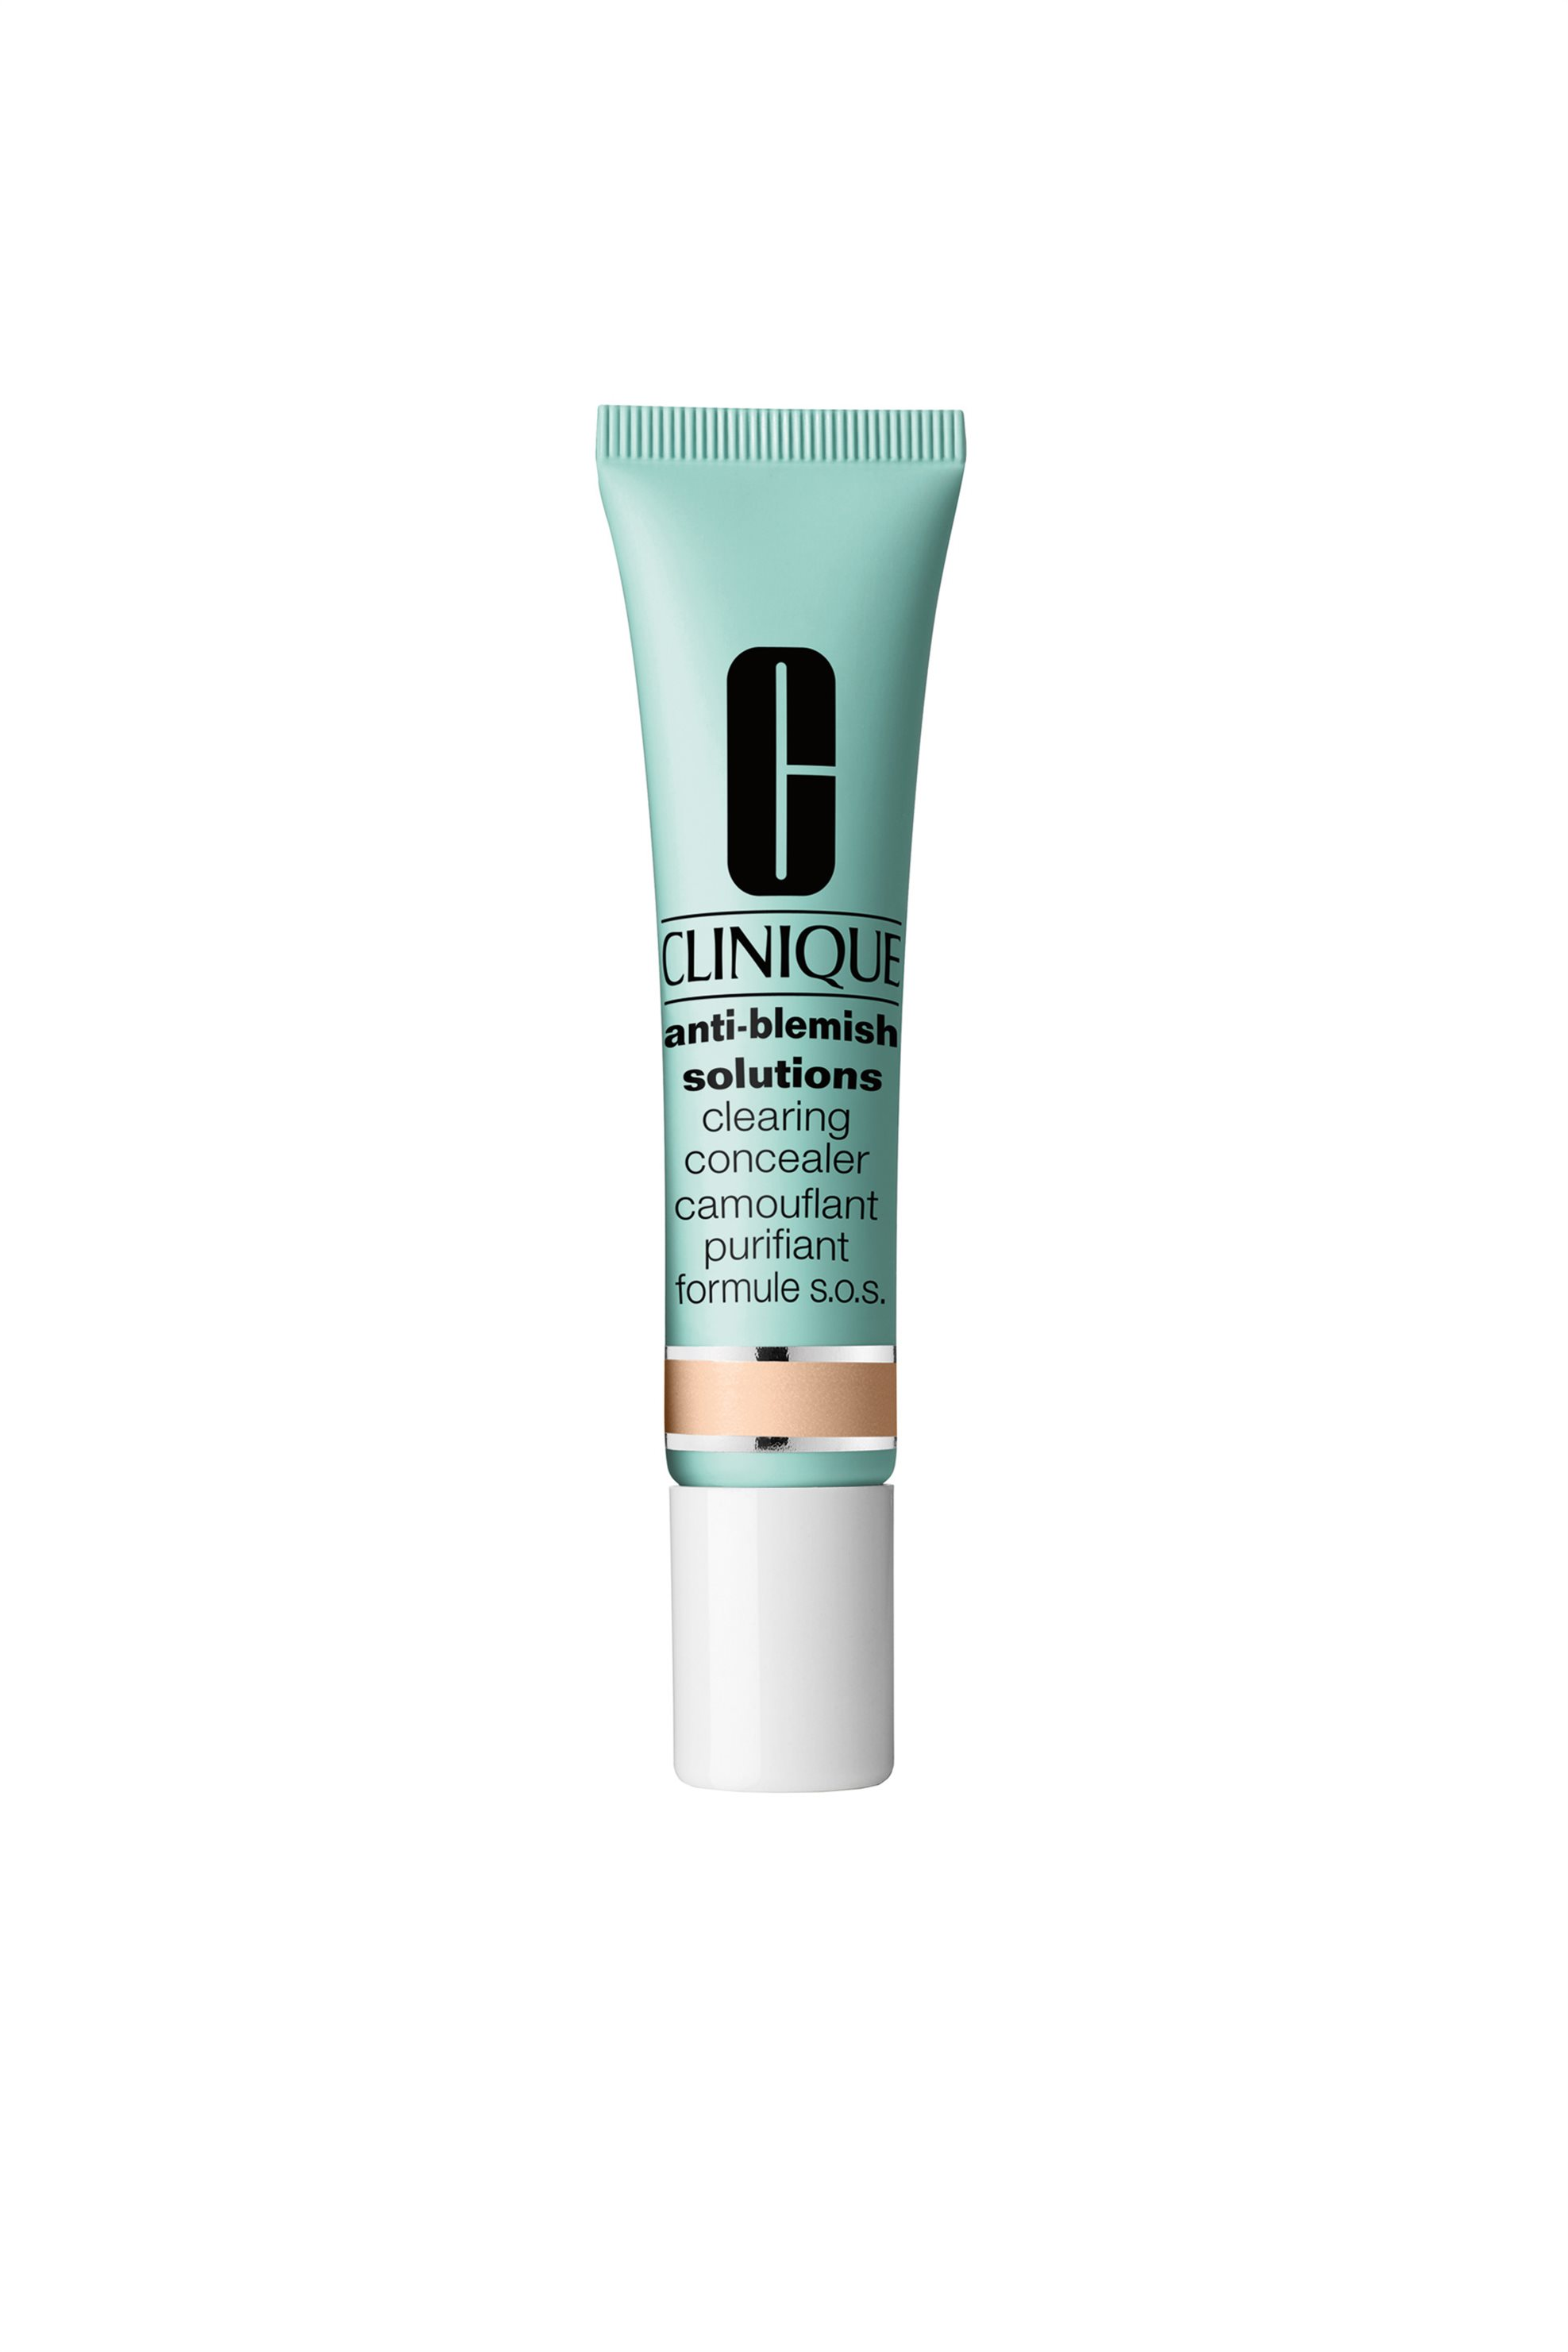 Clinique Anti-Blemish Solutions™ Clearing Concealer Shade 03 10 ml - 6N4T030000 ομορφια   καλλυντικα επιλεκτικησ   μακιγιάζ   πρόσωπο   concealers